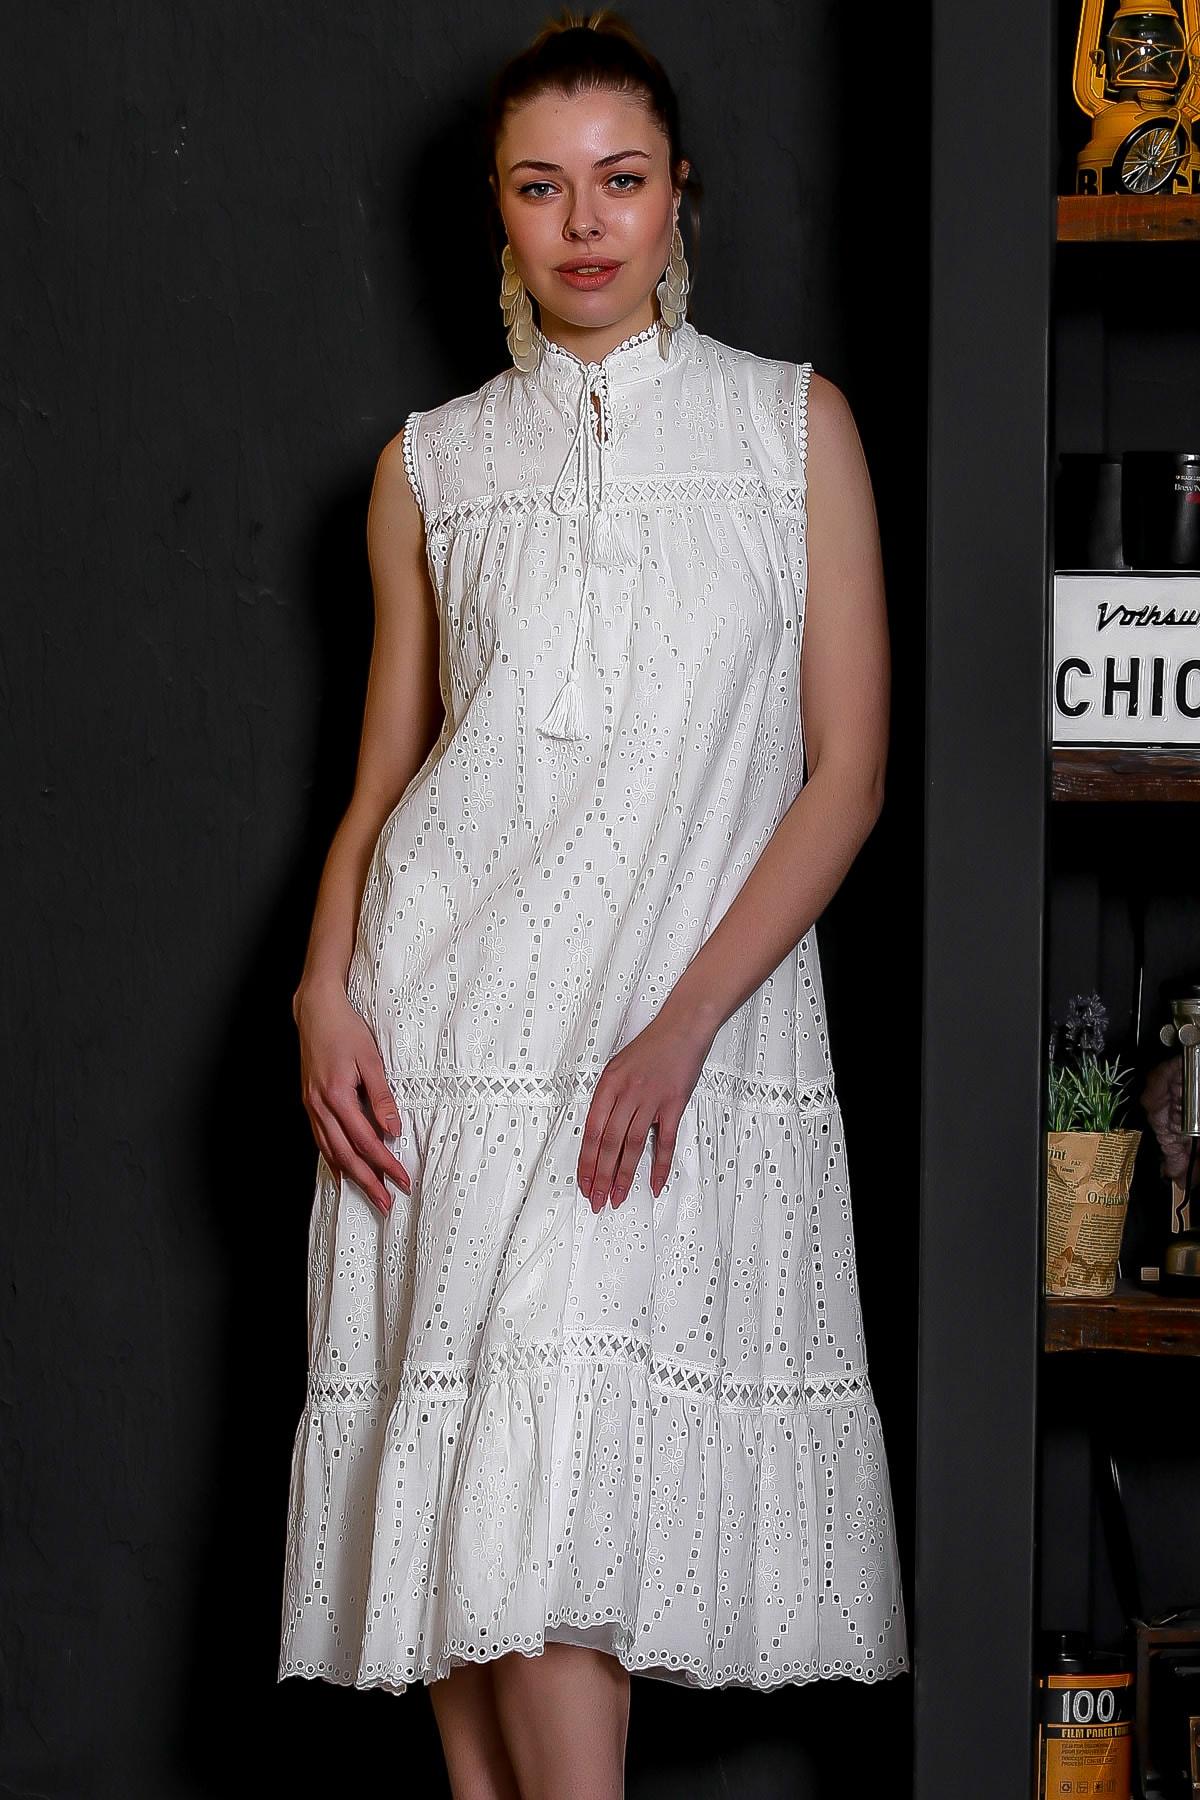 Chiccy Kadın Beyaz Fisto Kumaş Hakim Yaka Kolsuz Astarlı Uzun Elbise M10160000EL95386